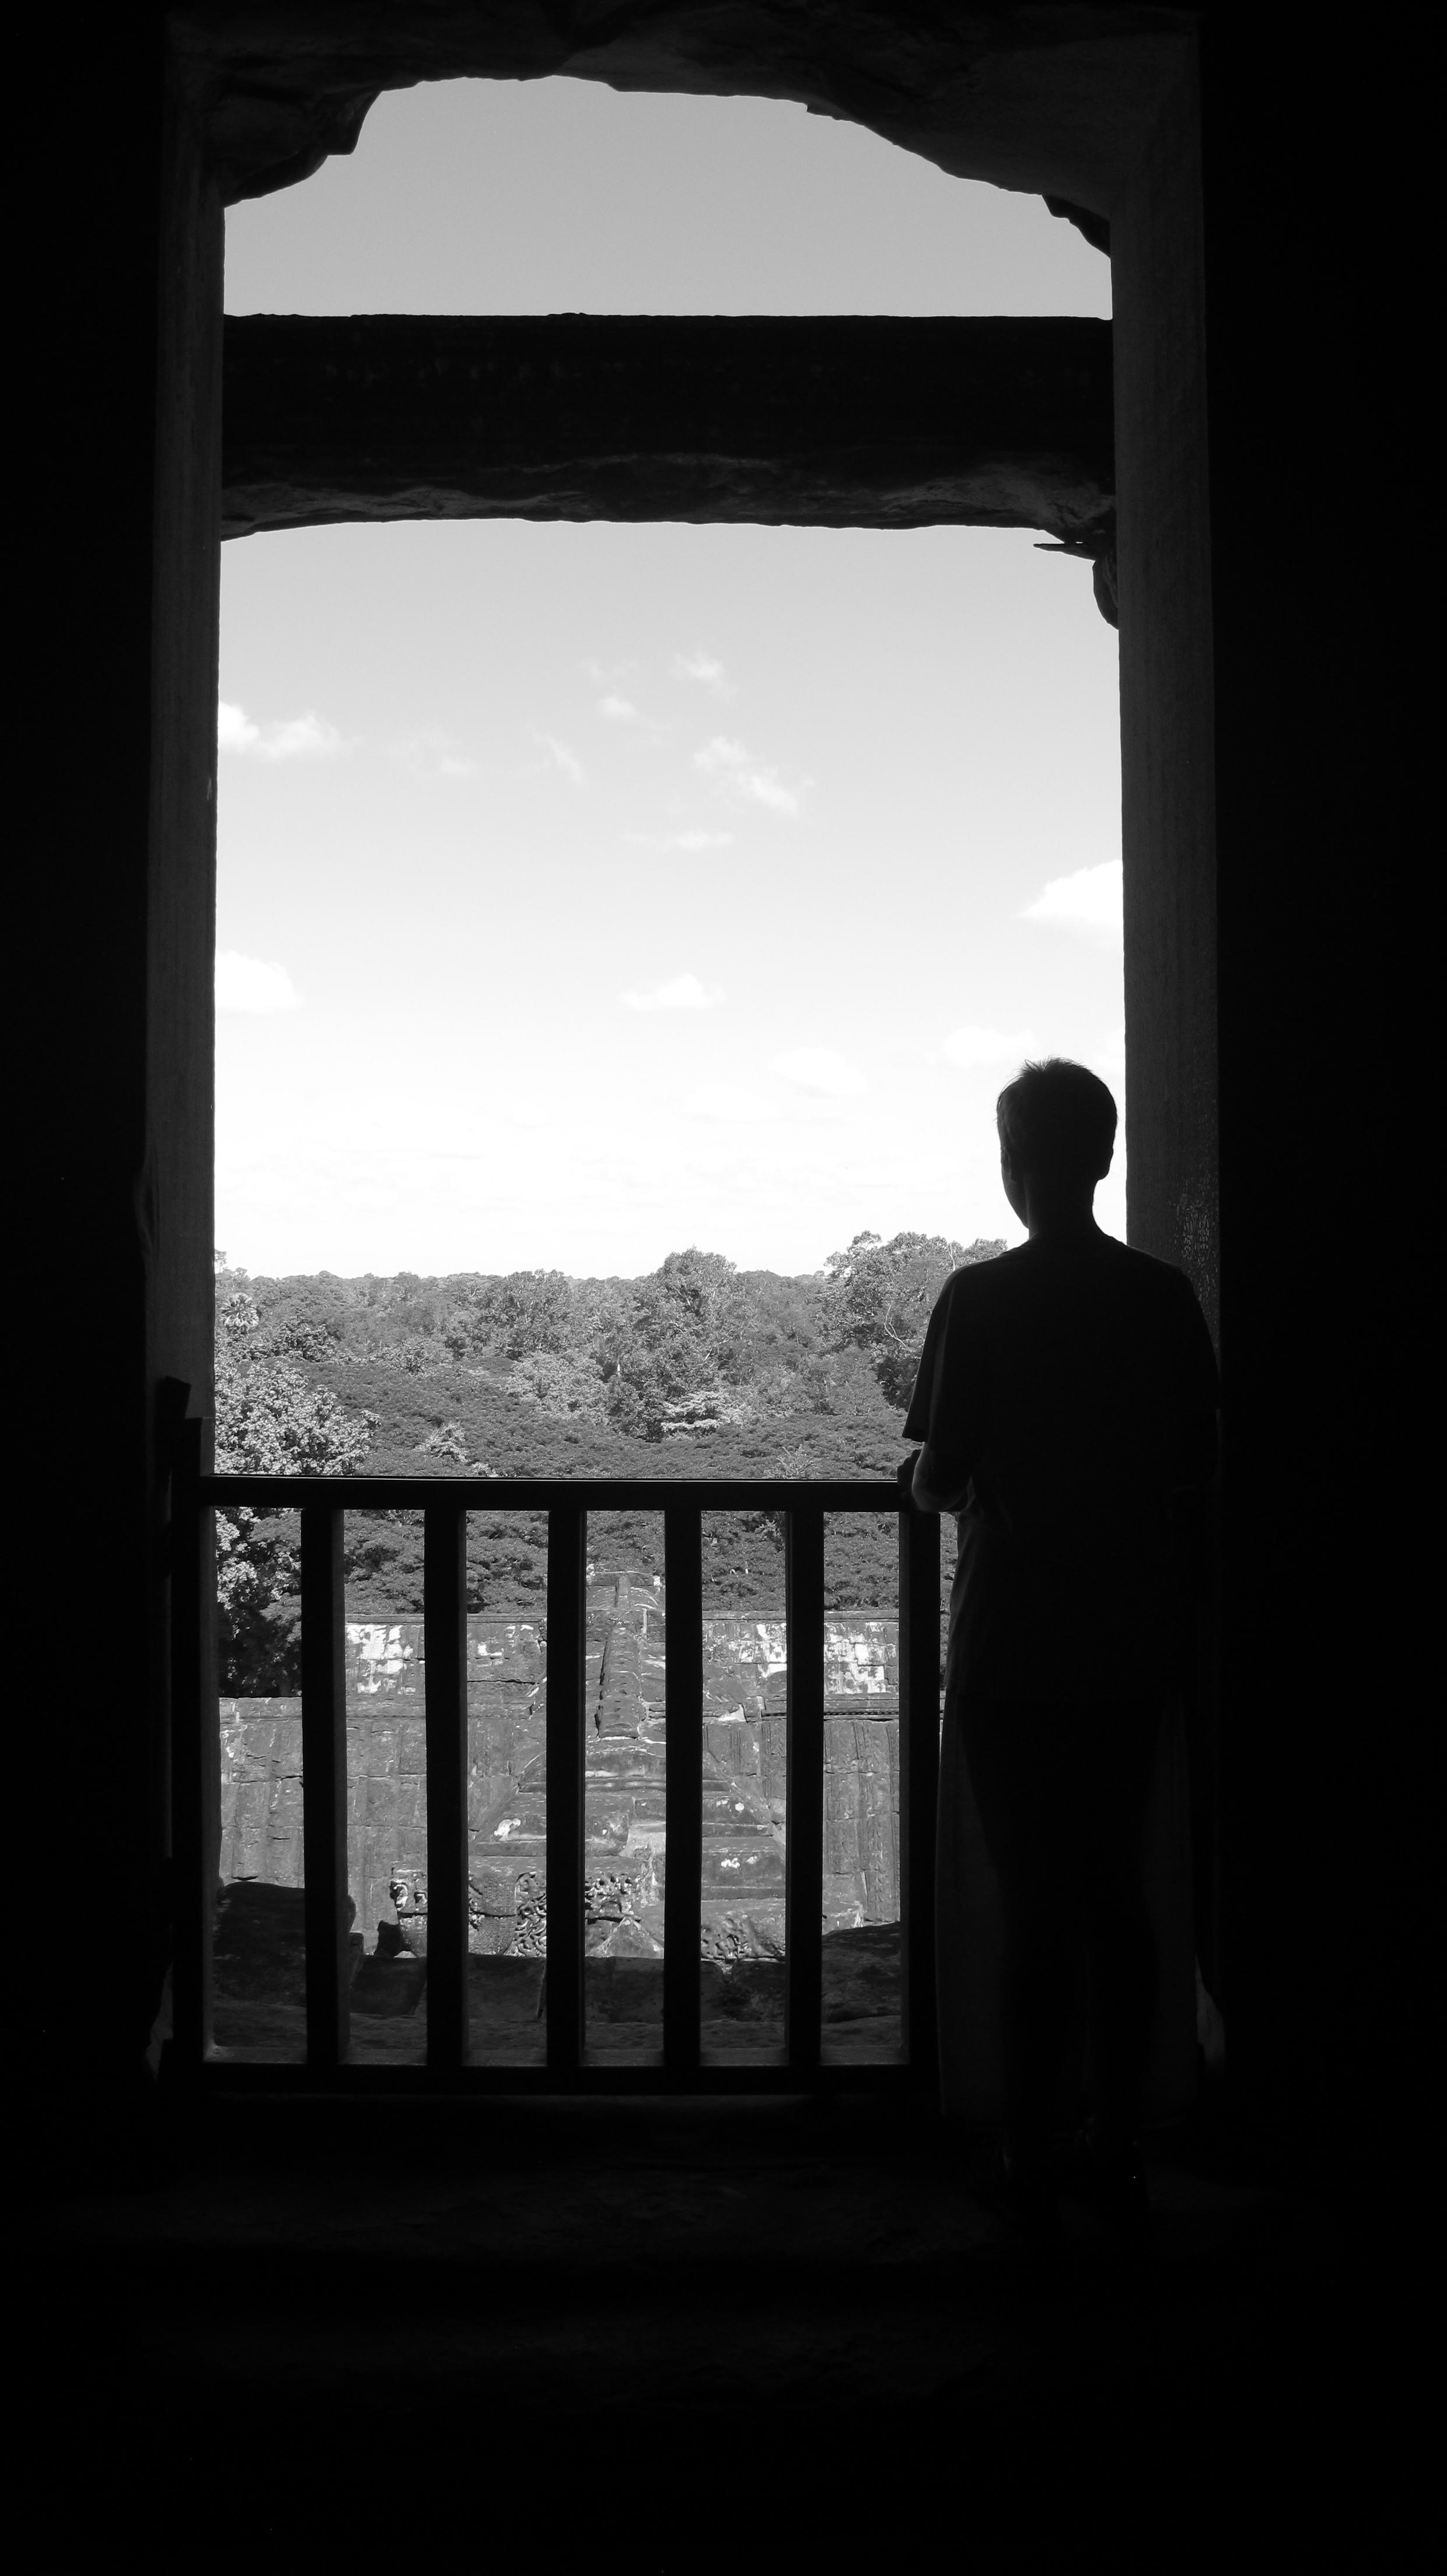 """Love to Cambodia"" - Angkor Wat, Siem Reap, Cambodia"